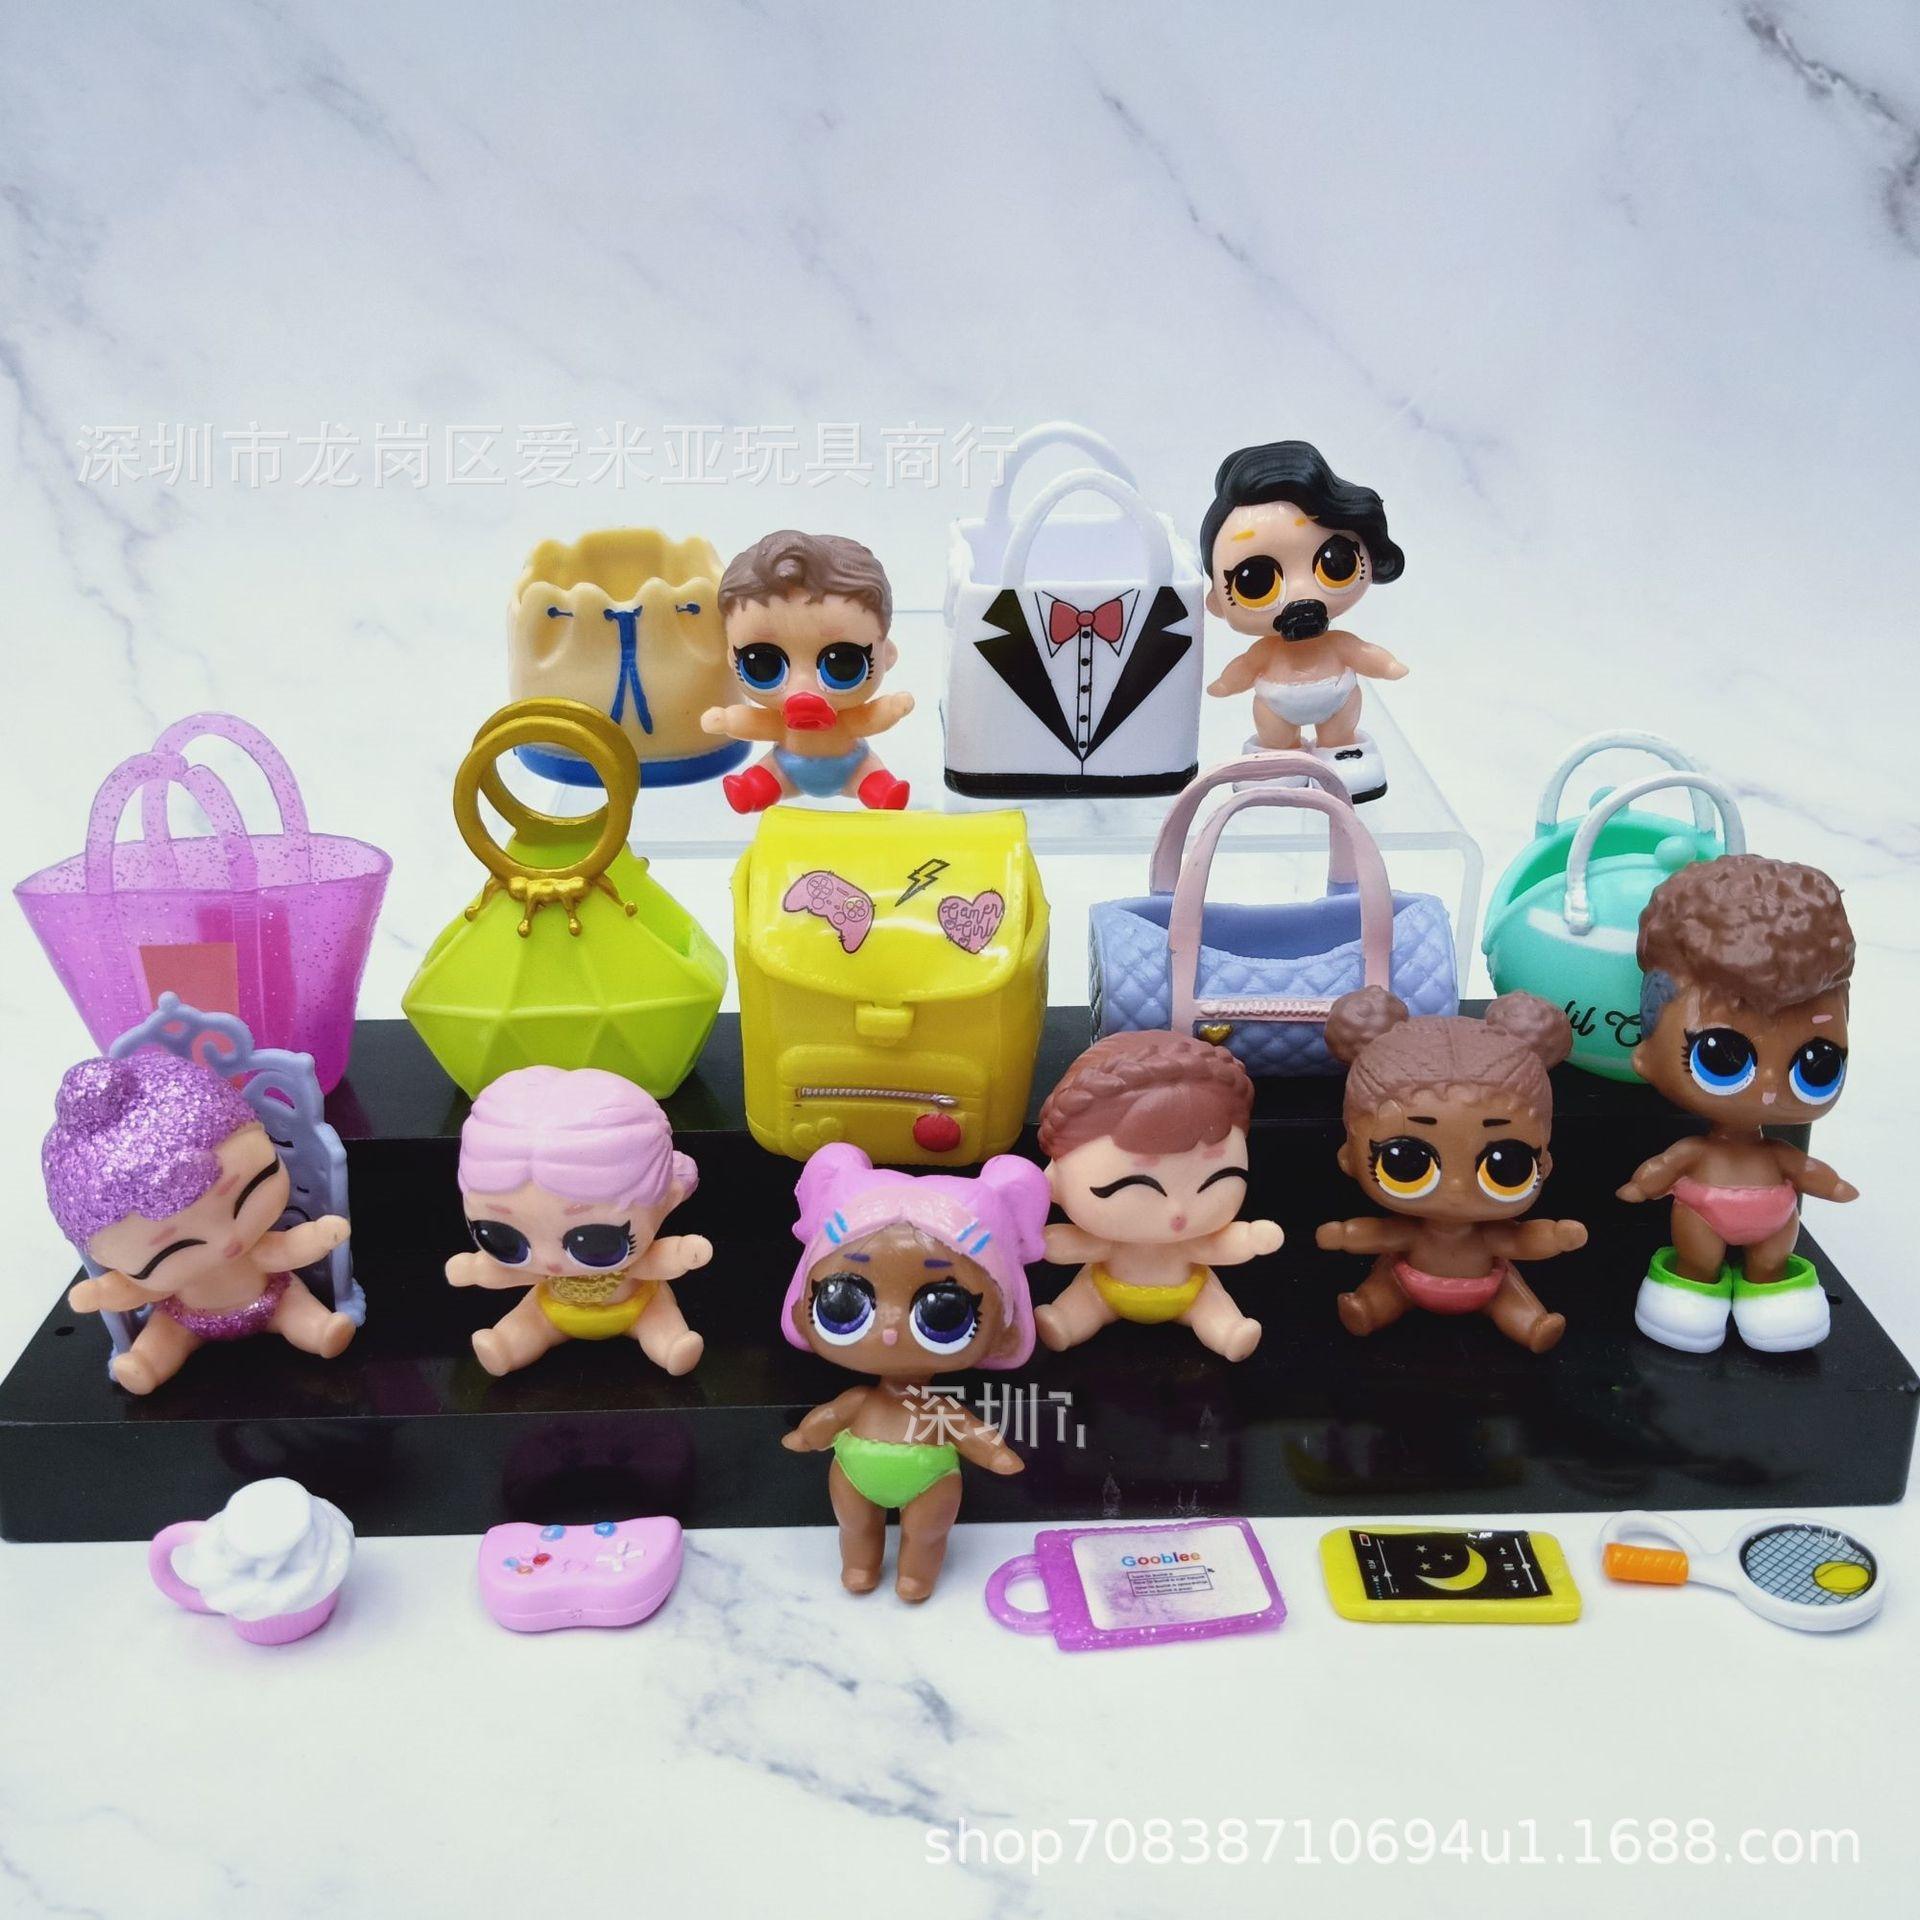 10 Set LOL Surprise Big Sisters Doll Shoes Kids Gift Toy Random